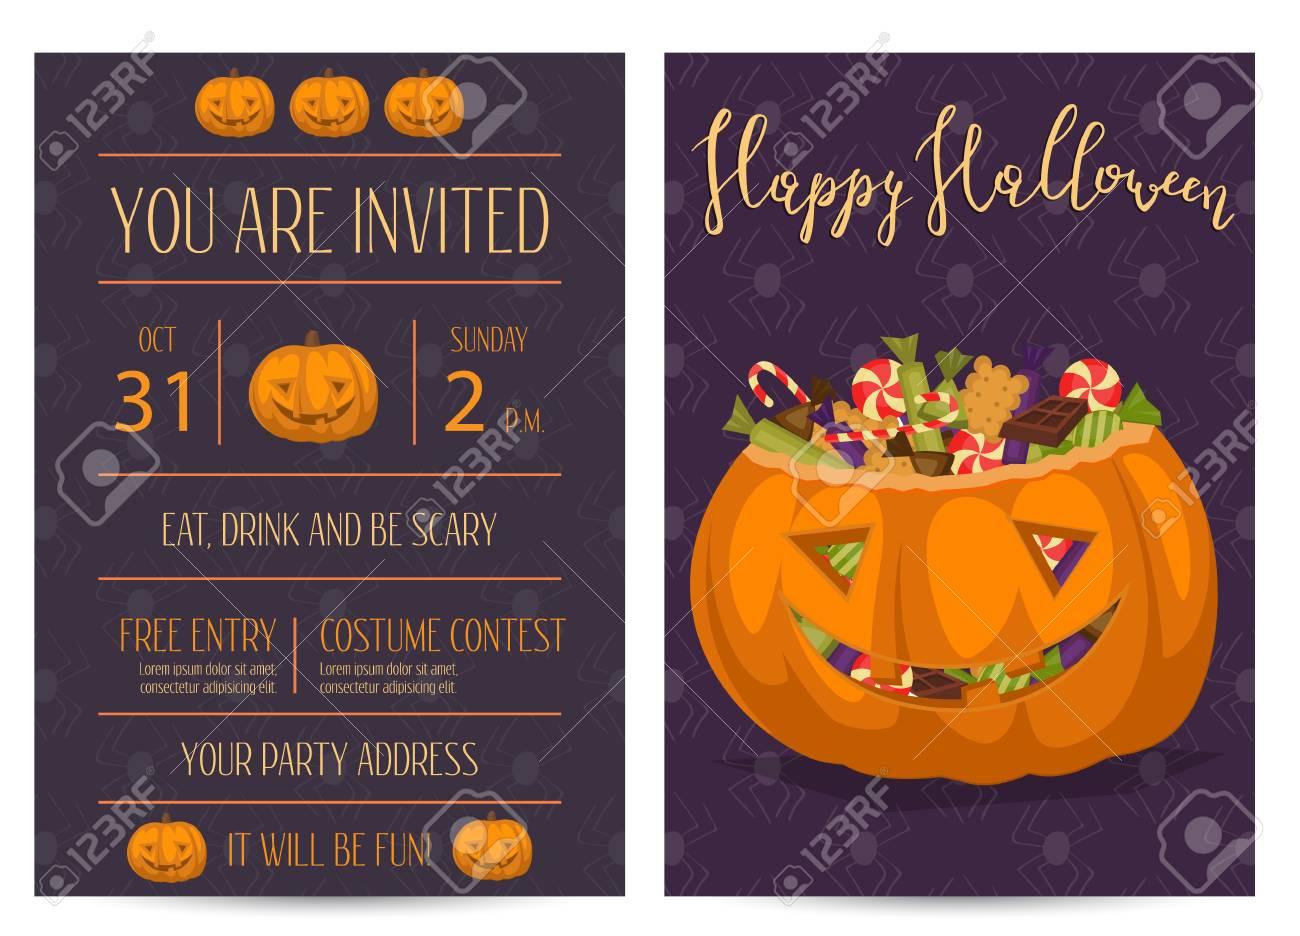 Happy Halloween Party Invitations With Scary Pumpkin Head Jack ...